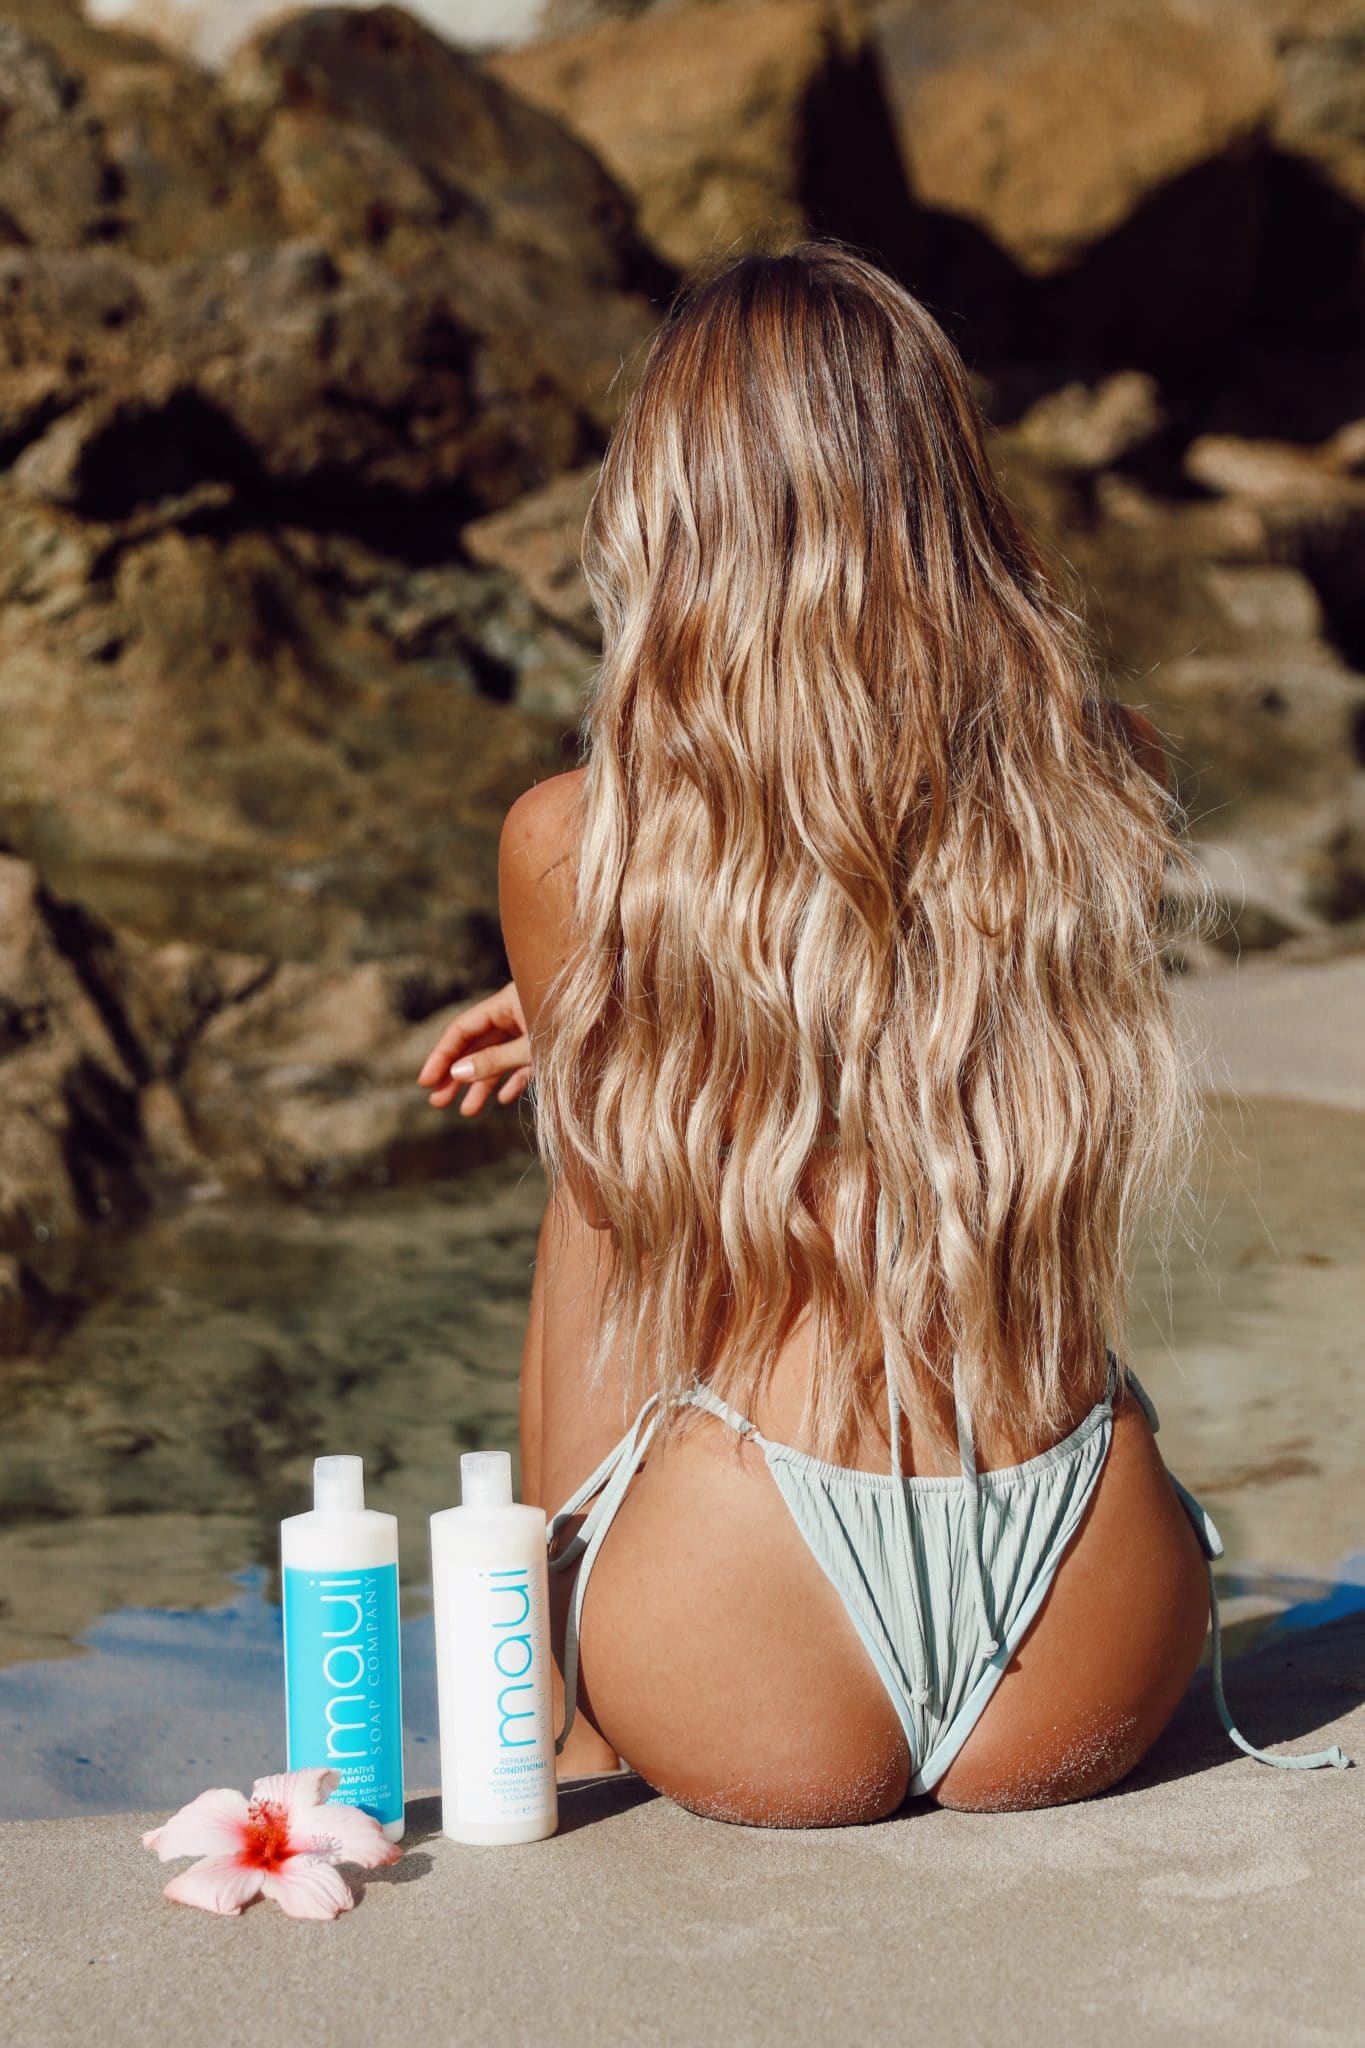 Maui Soap Co Hair Care shampoo and conditioner